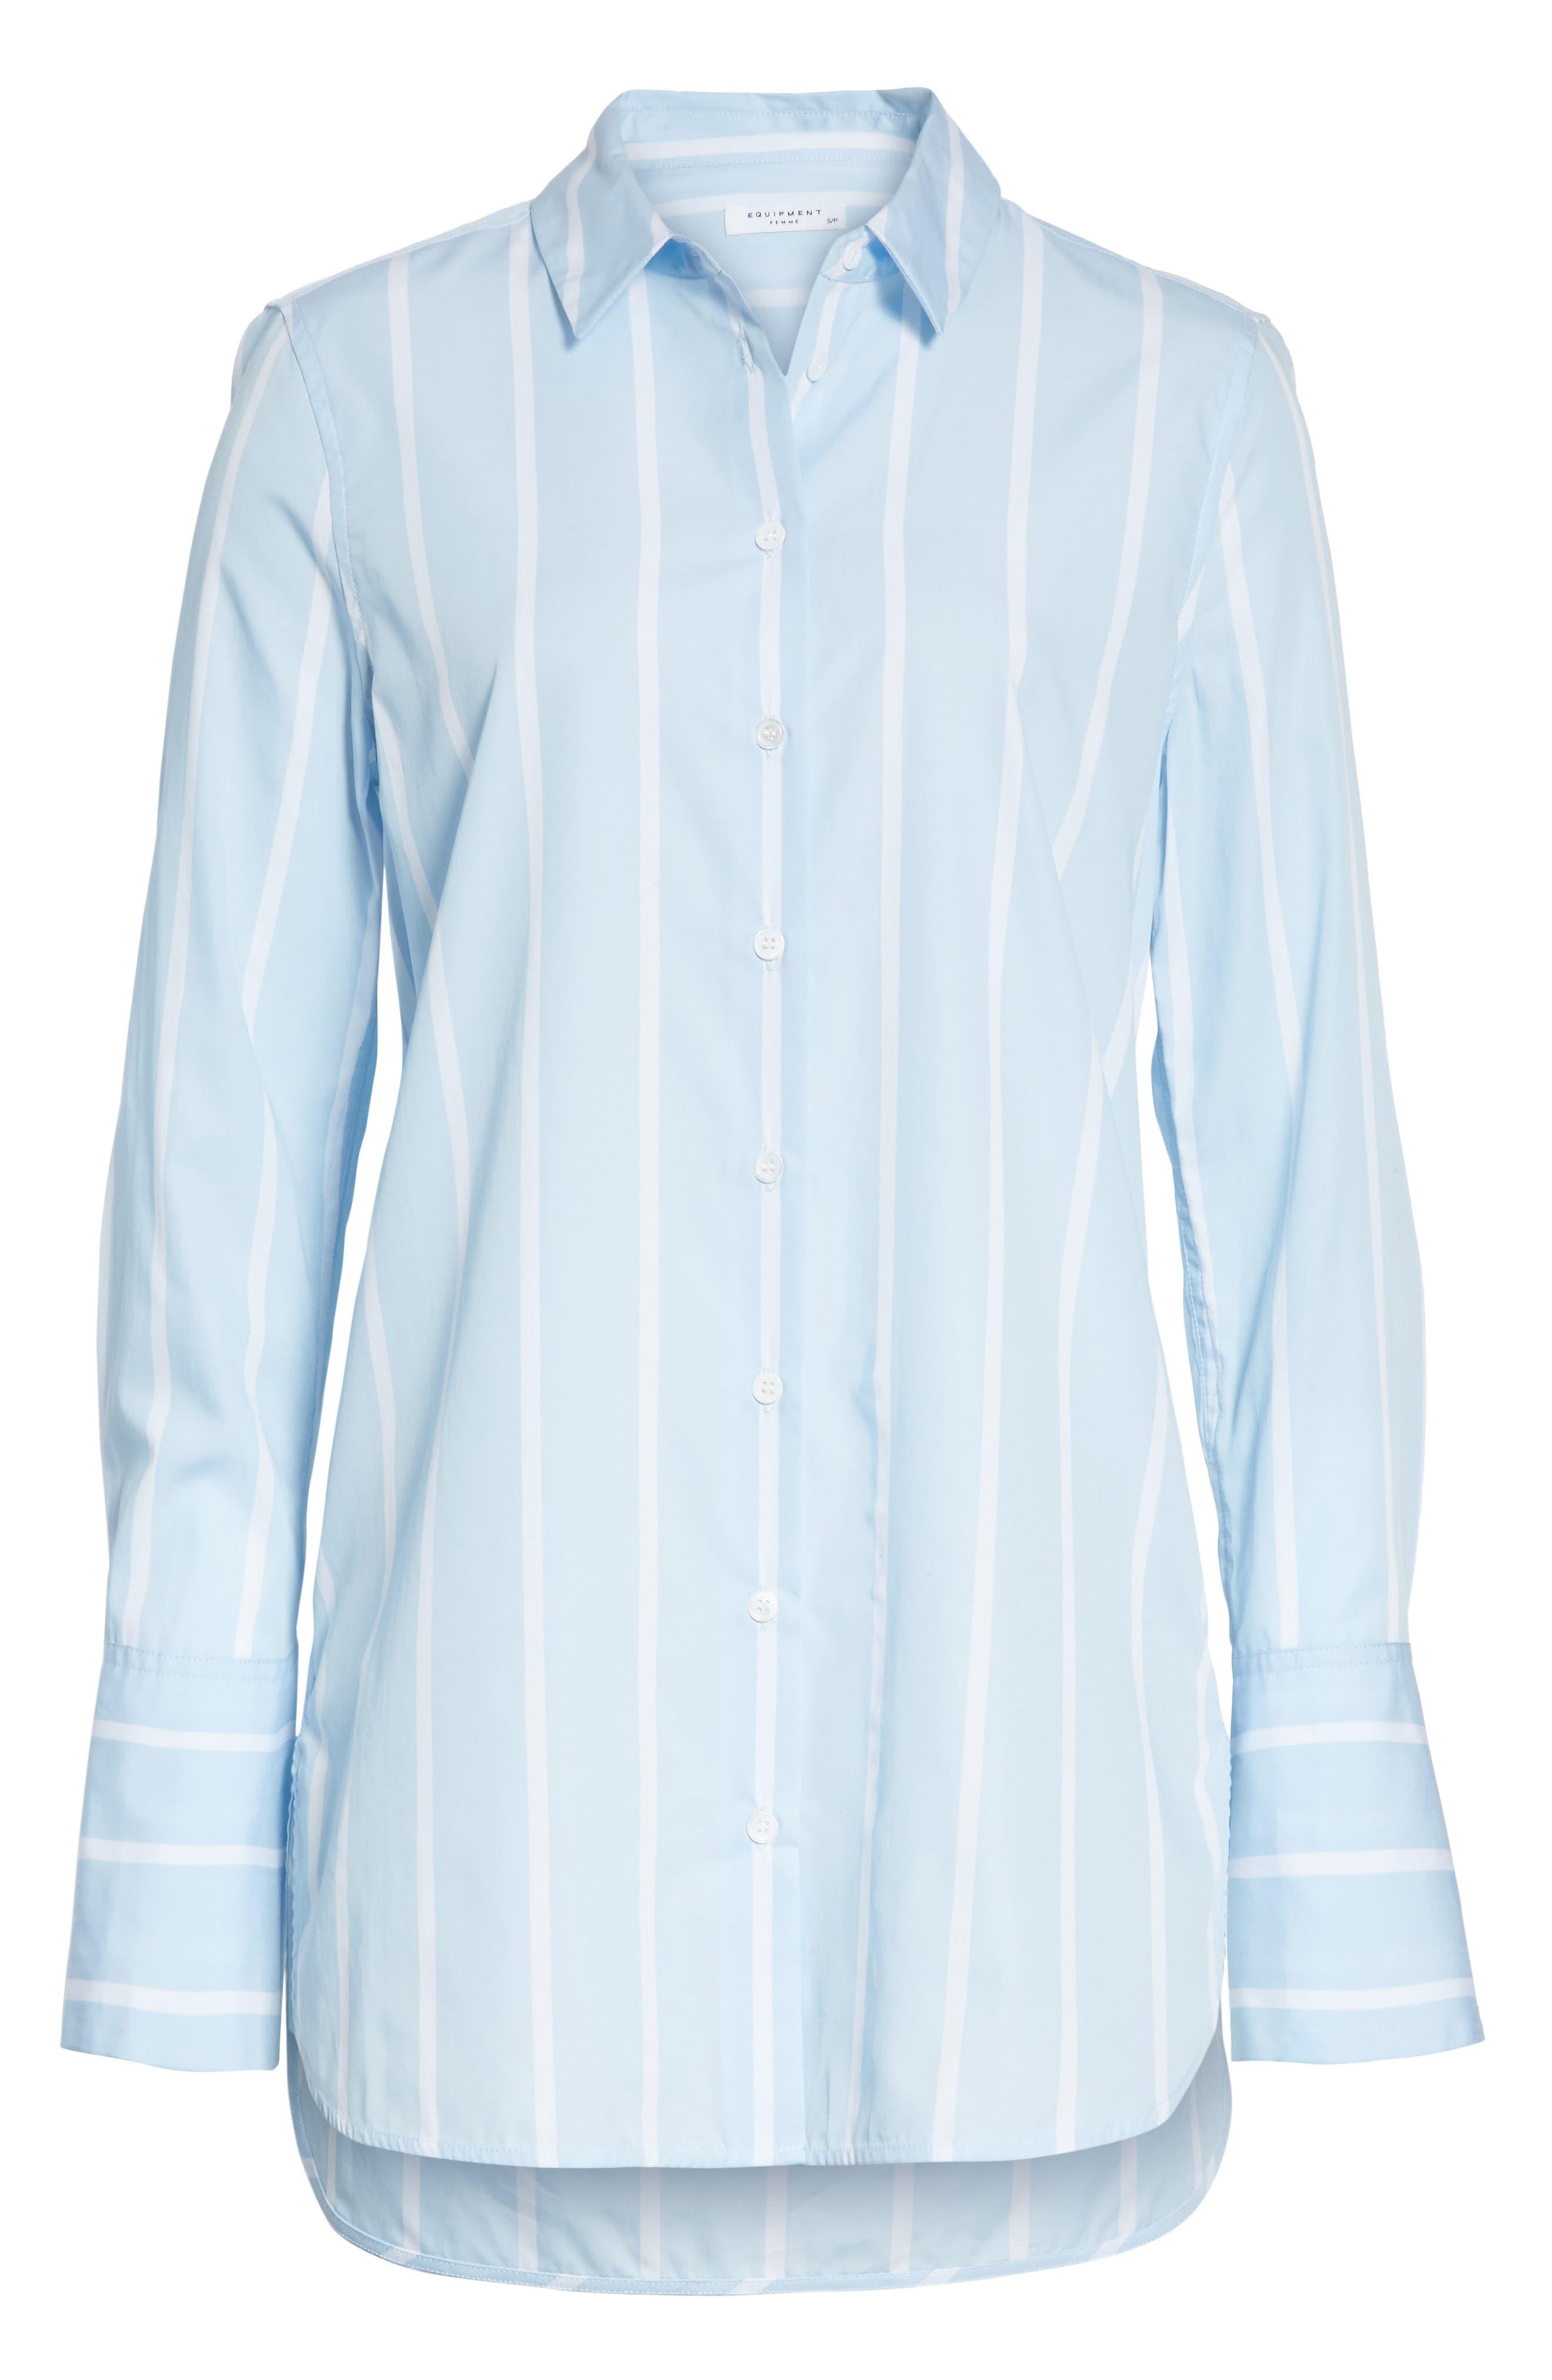 Arlette Stripe Cotton Shirt,                             Alternate thumbnail 6, color,                             498